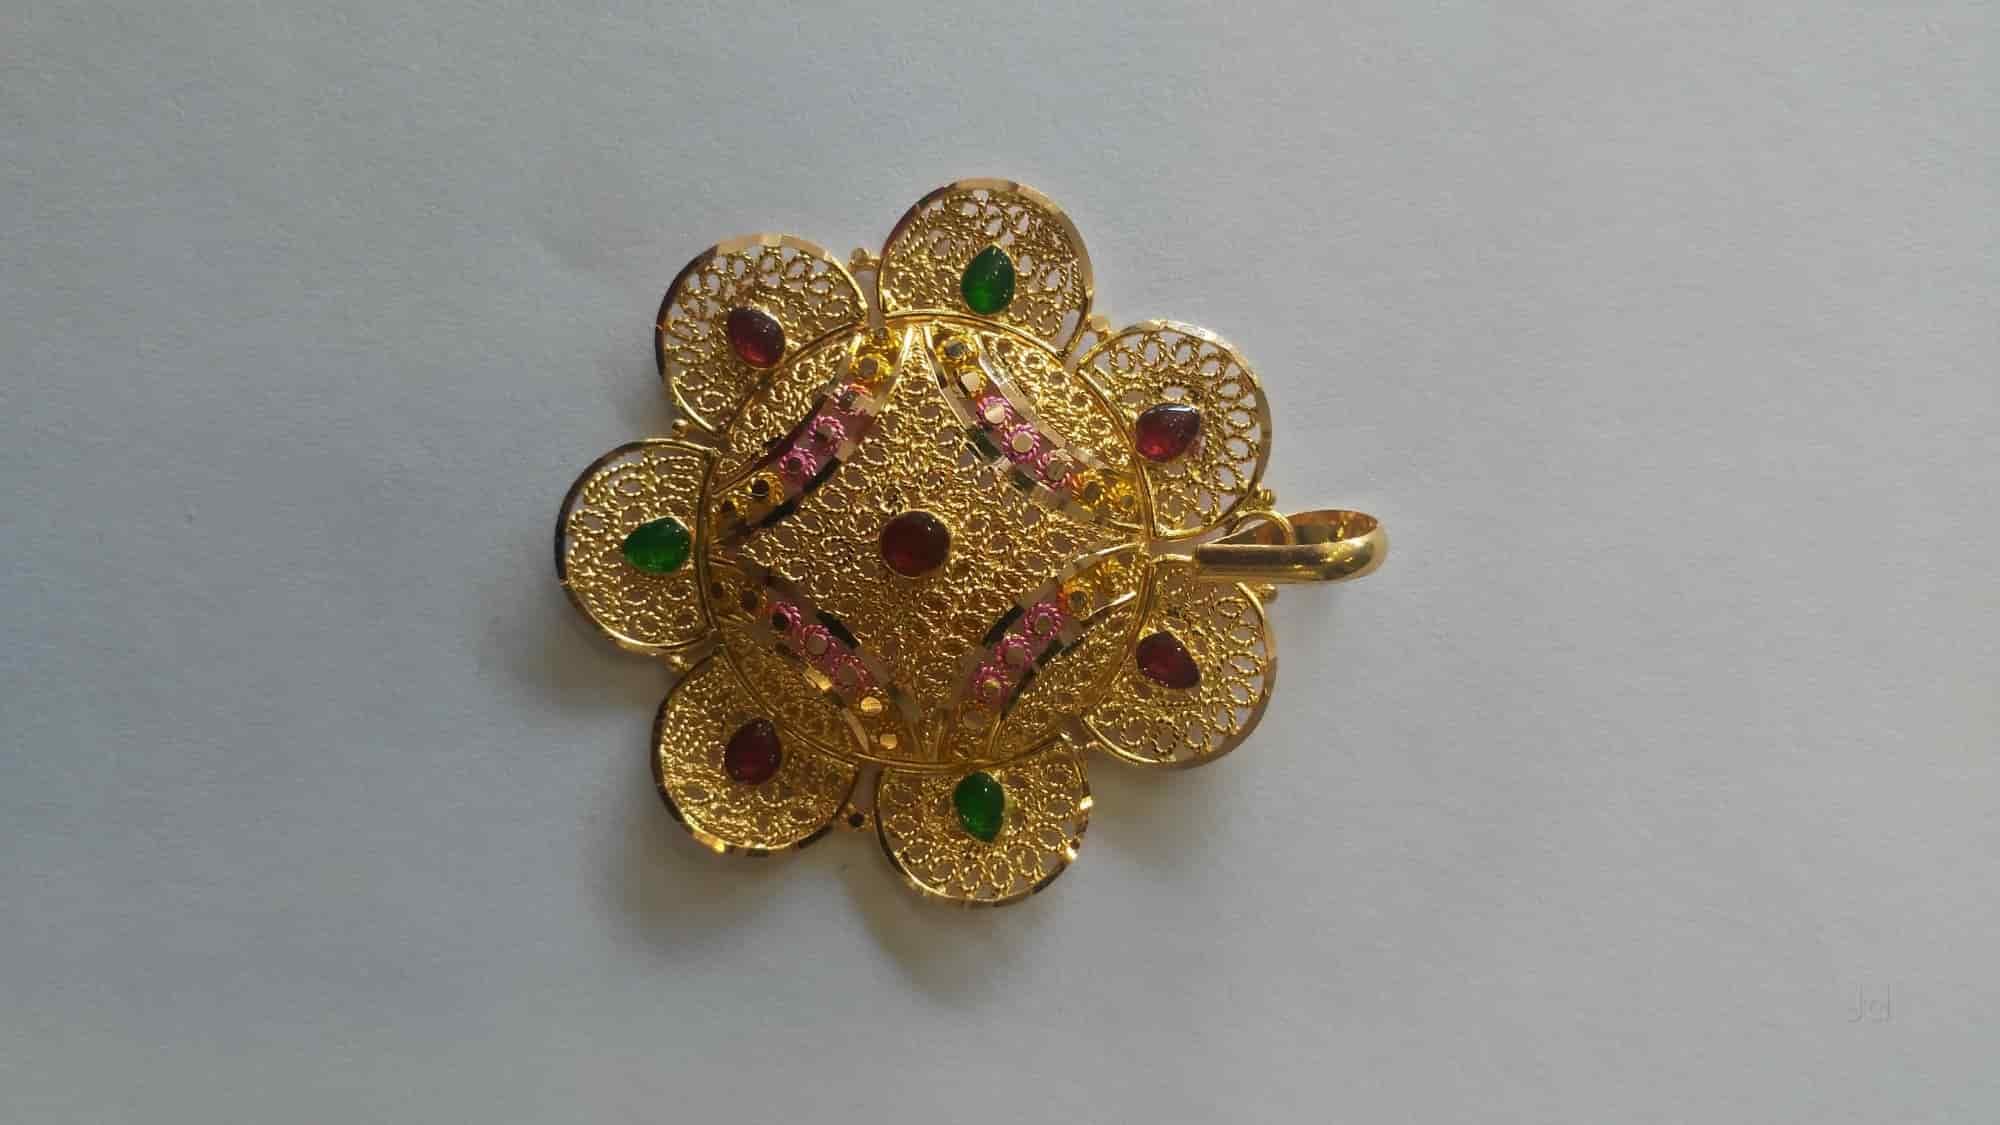 Rajadhani Jewellery Vittal Jewellery Showrooms in Mangalore